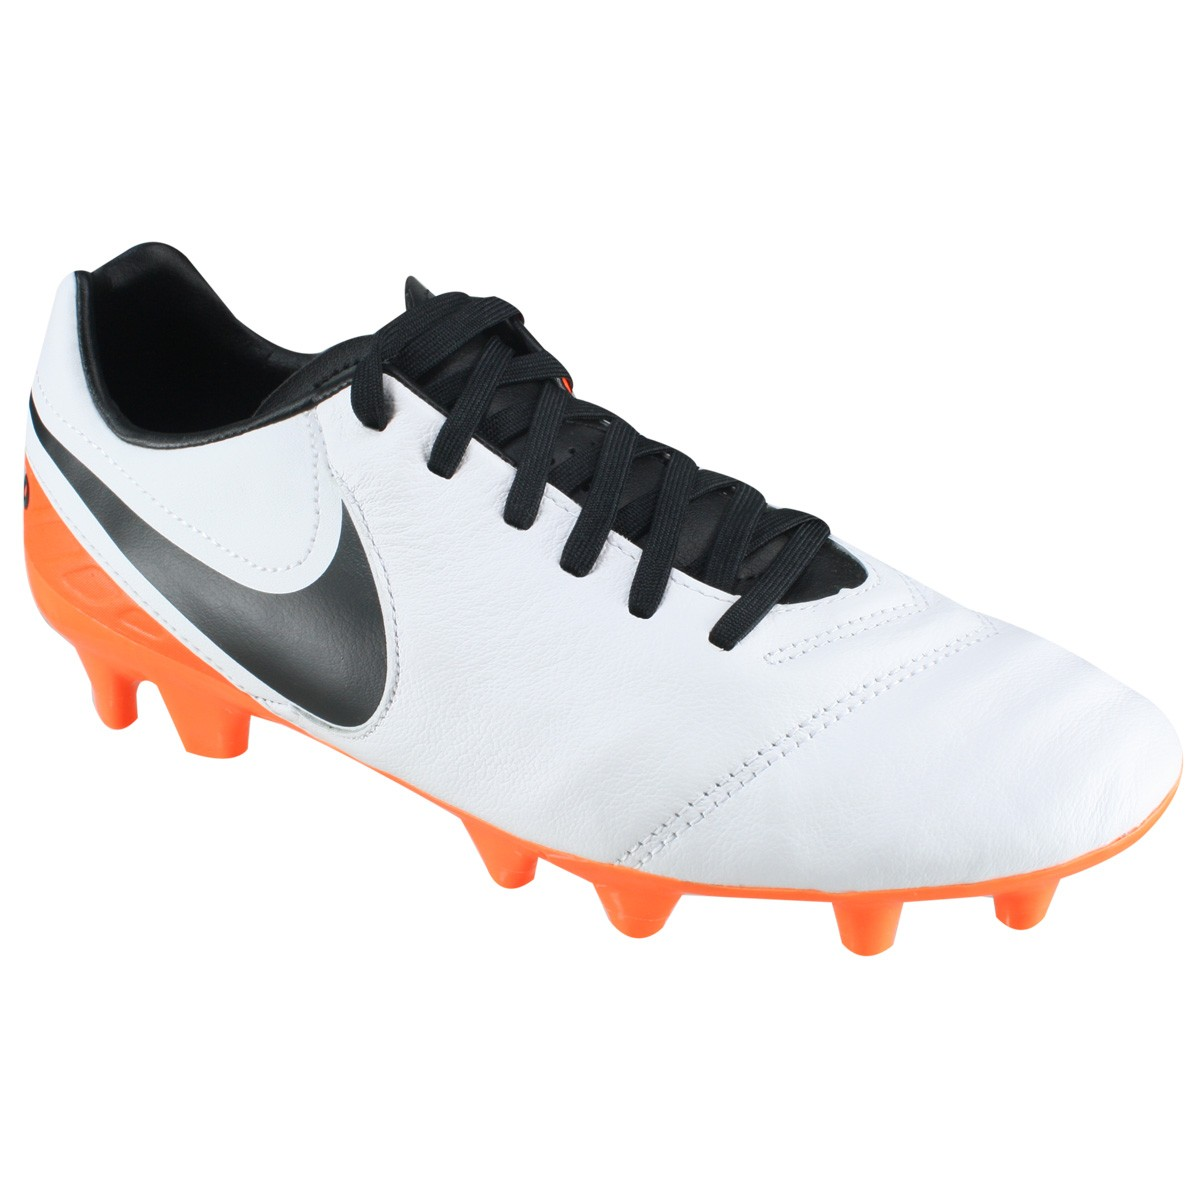 201dc35c31449 Chuteira Campo Nike Tiempo Mystic V FG 819236-108 - Branco Laranja ...